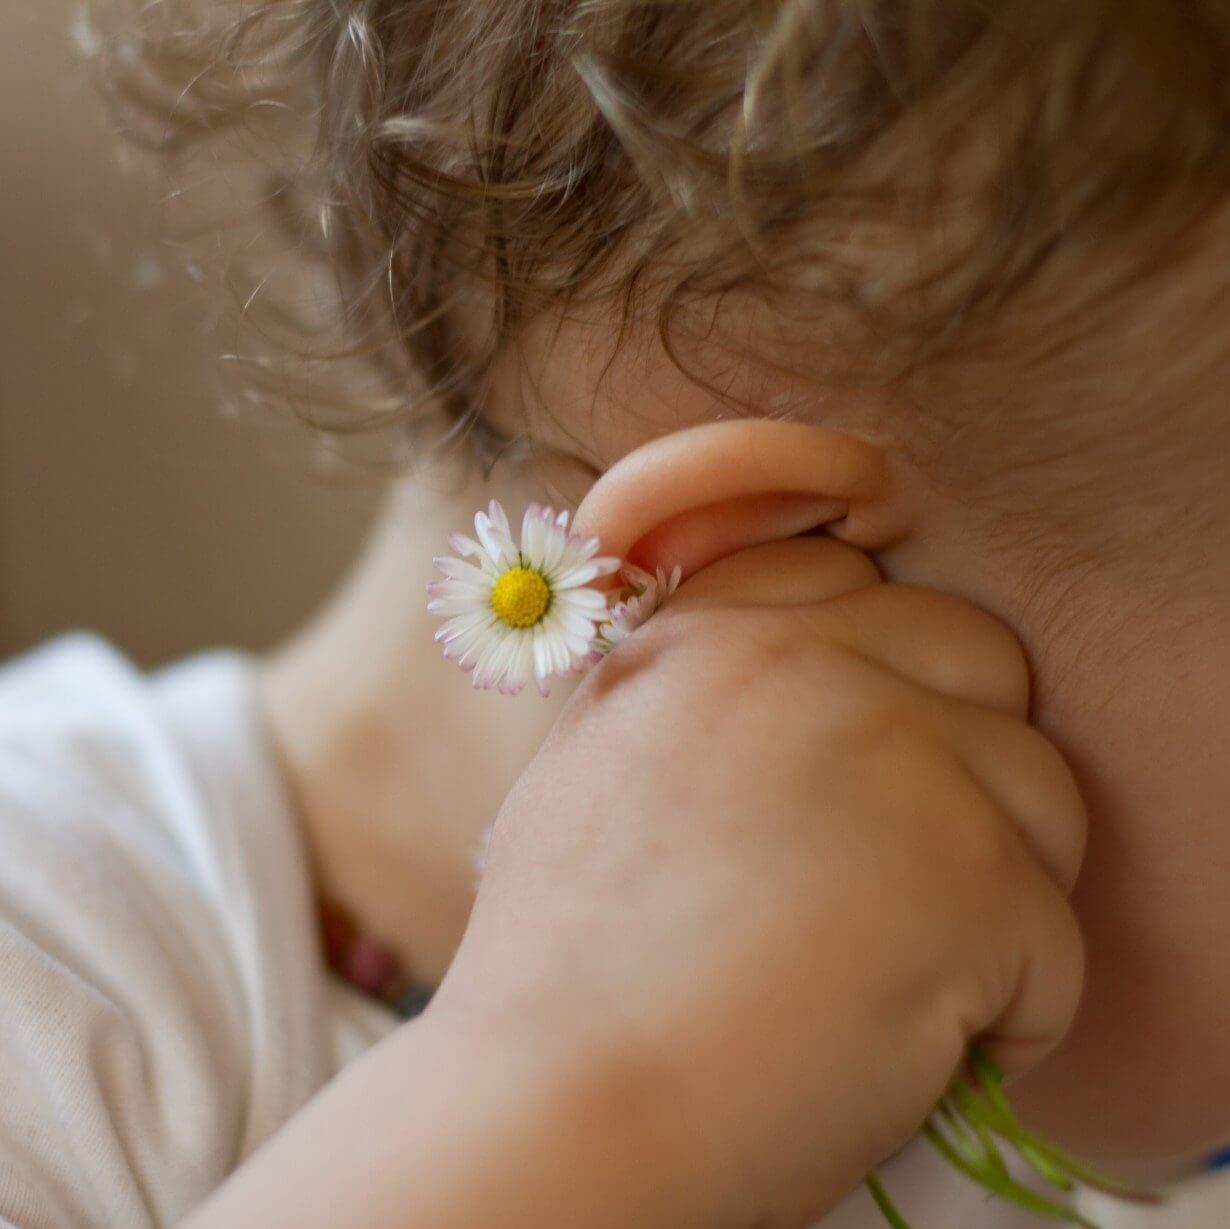 Hörtest bei Kindern